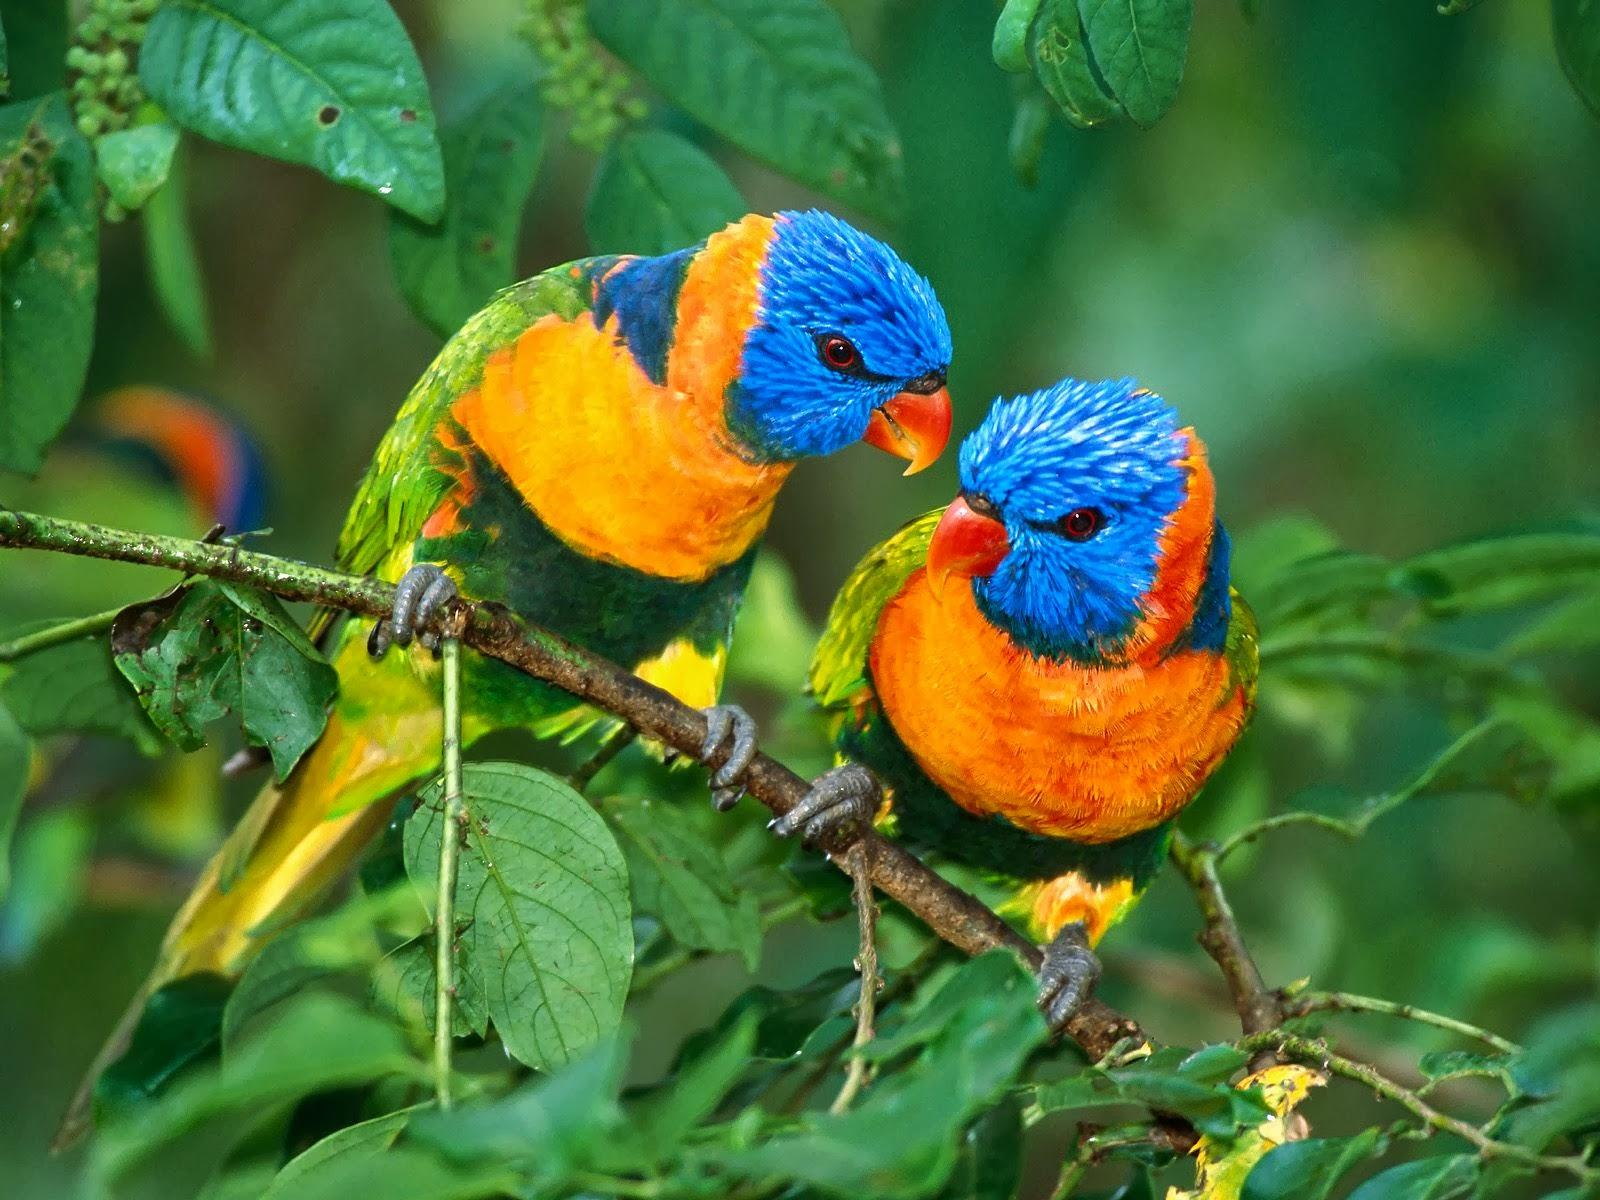 A Beautiful Couple Of Lorikeet Birds Wallpaper Hd: Beautiful Nice And Lovely Birds Images